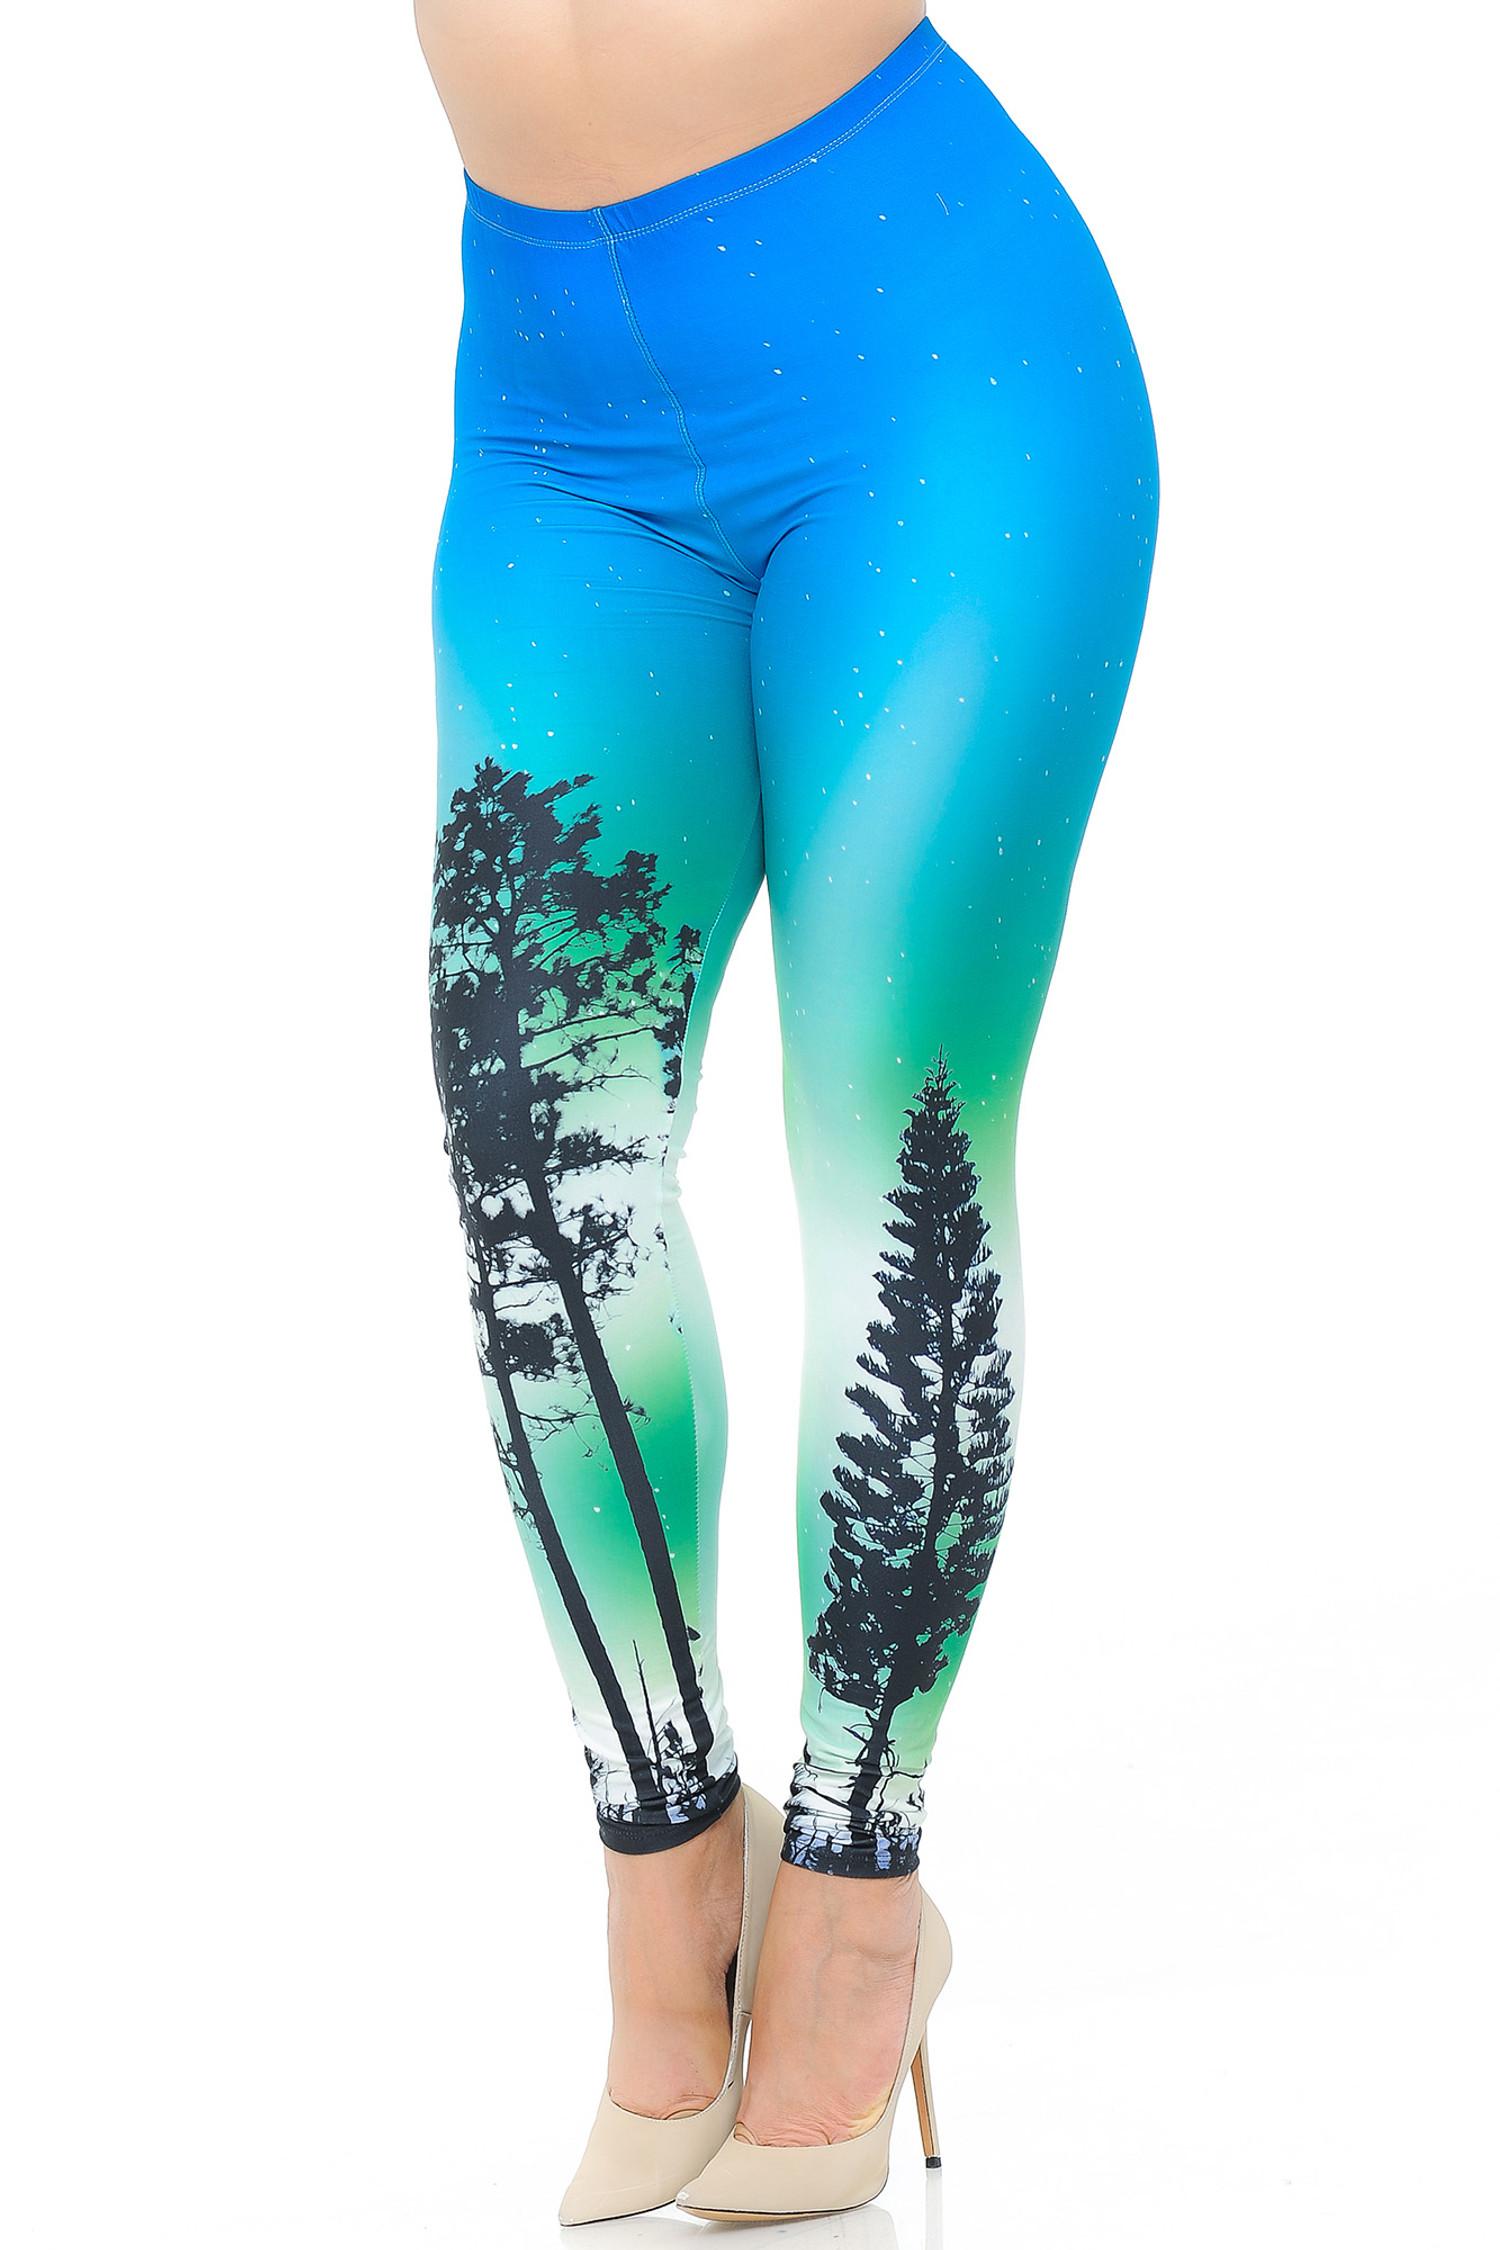 Creamy Soft Blue Sunset Plus Size Leggings - USA Fashion™